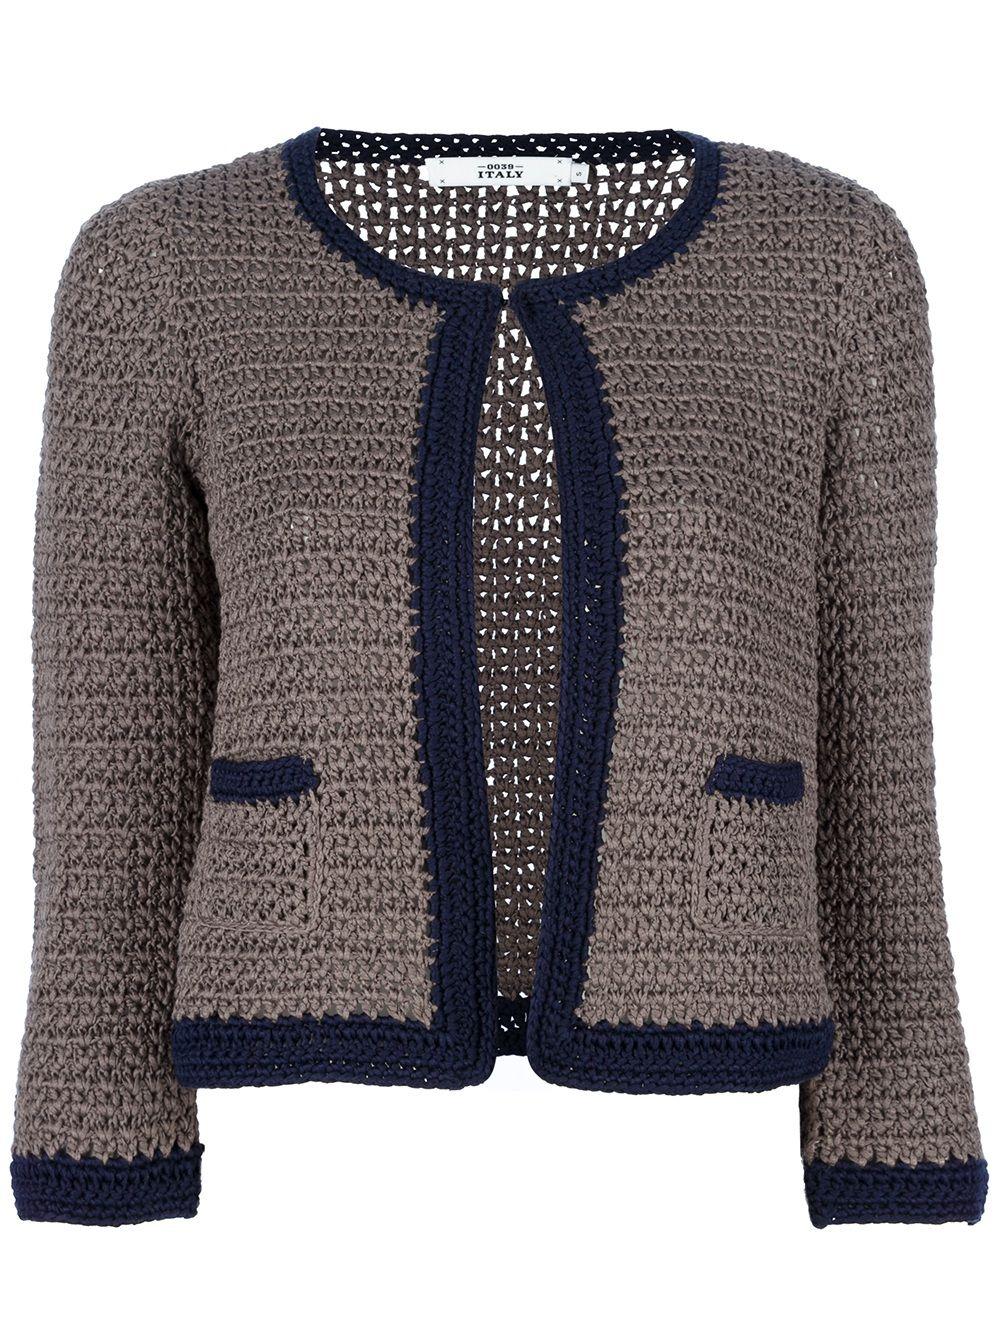 Photo of Designer knitwear for women